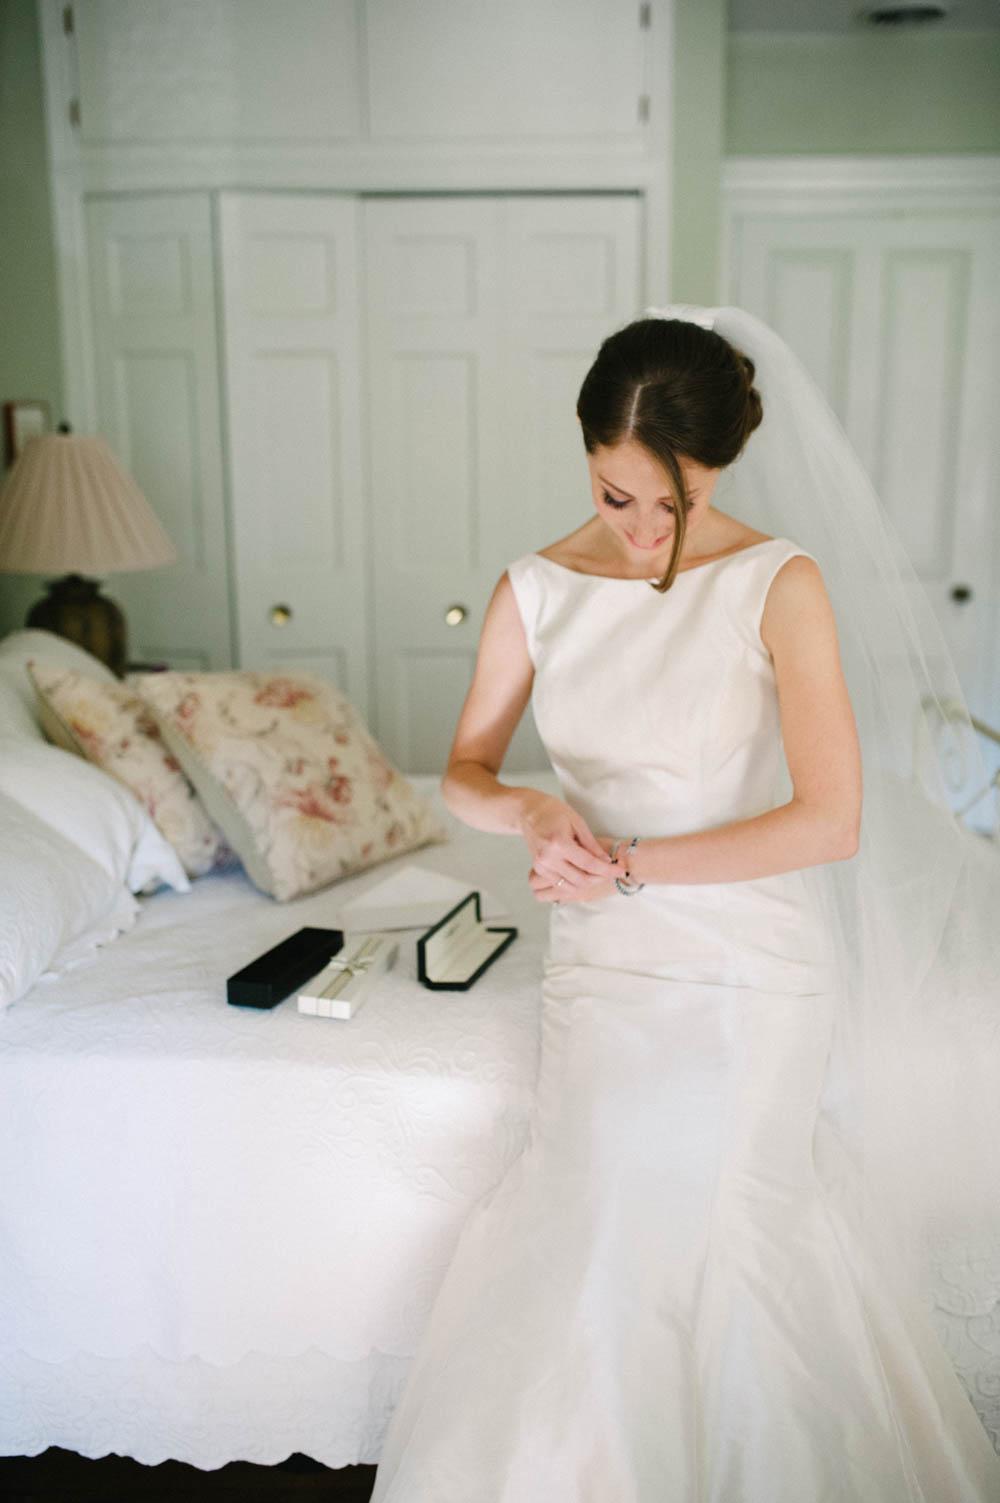 wintergarden-wedding-pittsburgh-40.jpg